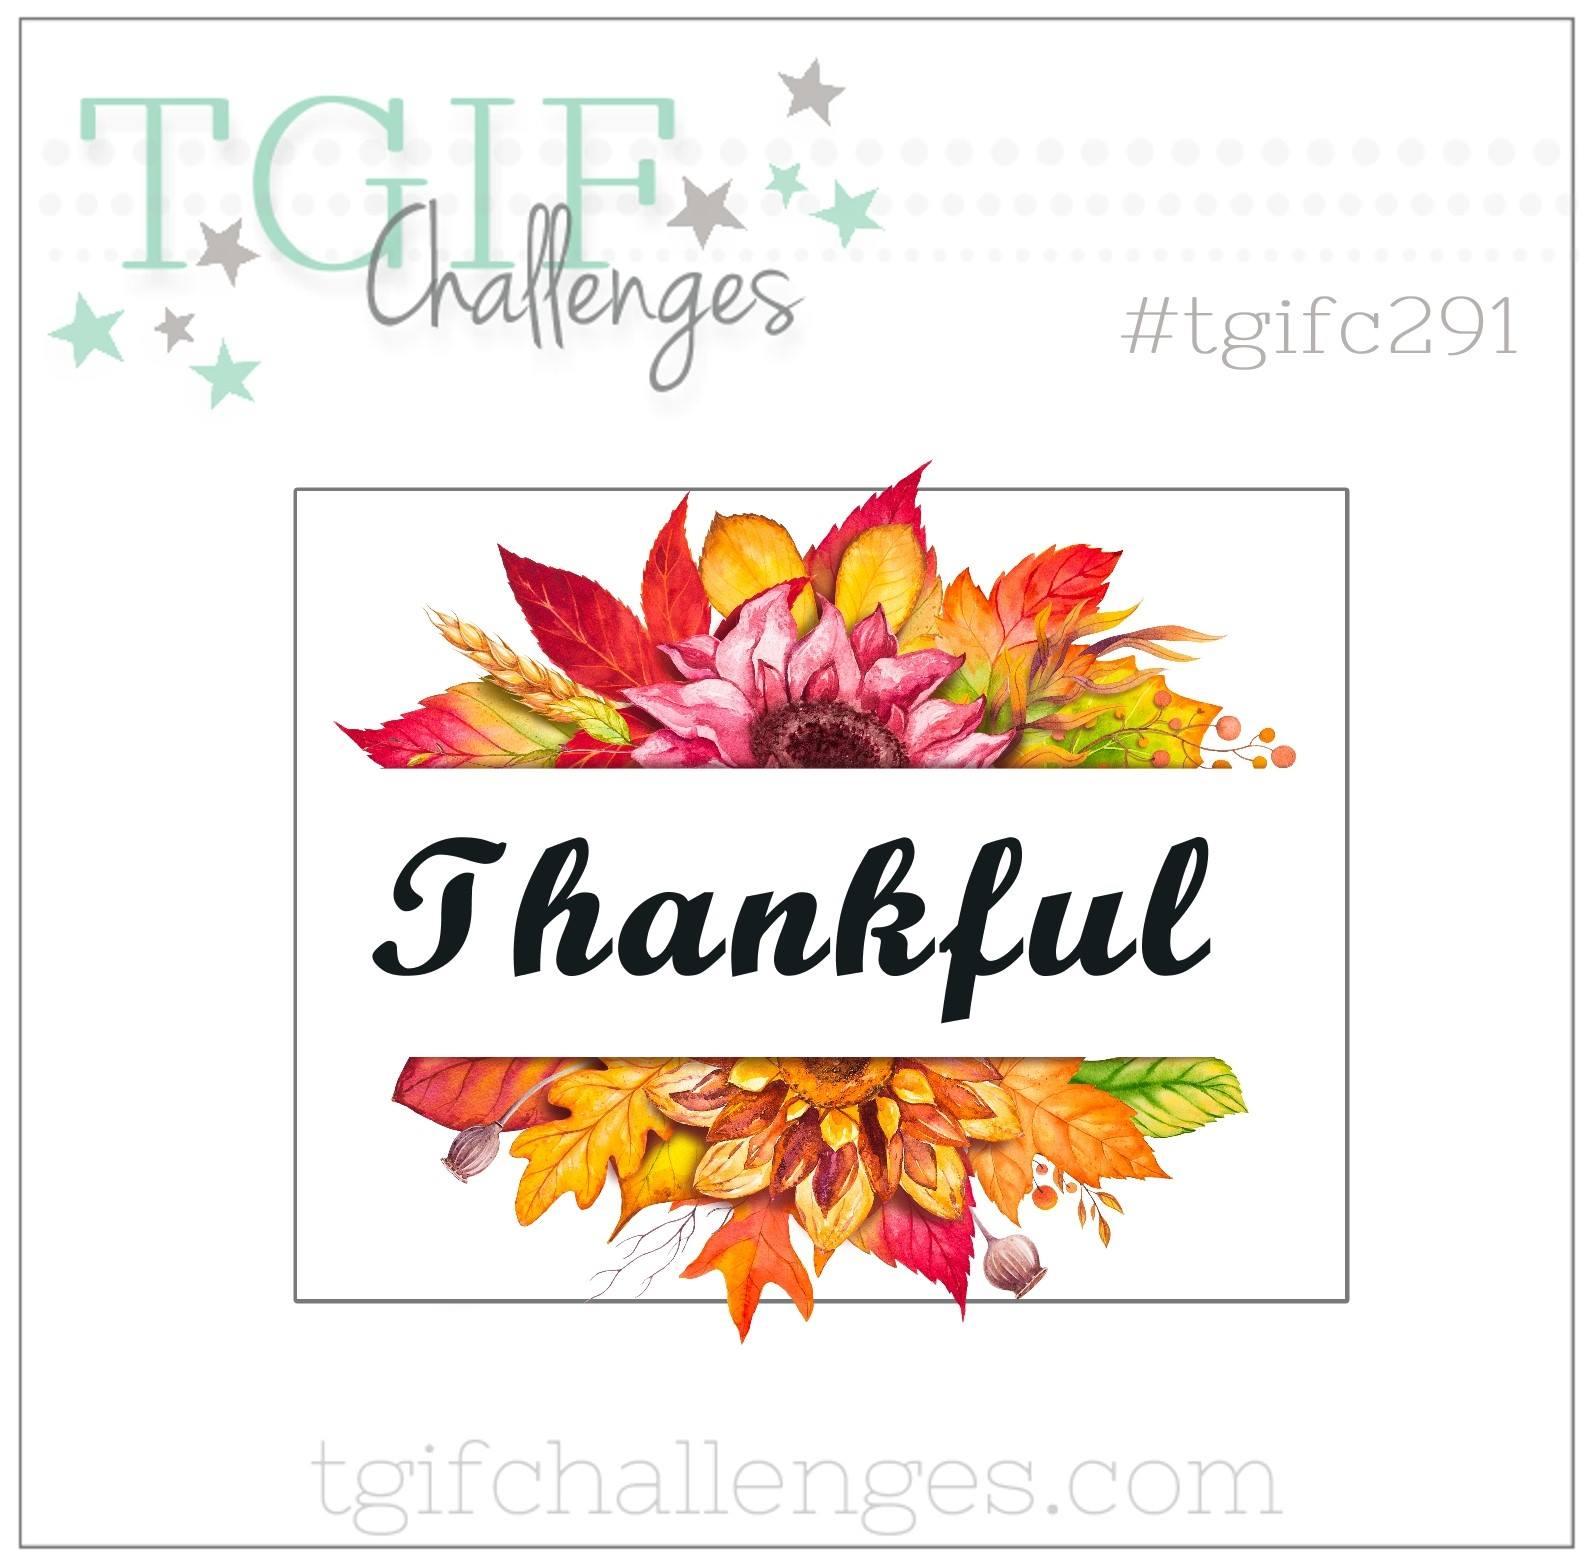 tgifc291 Thankful